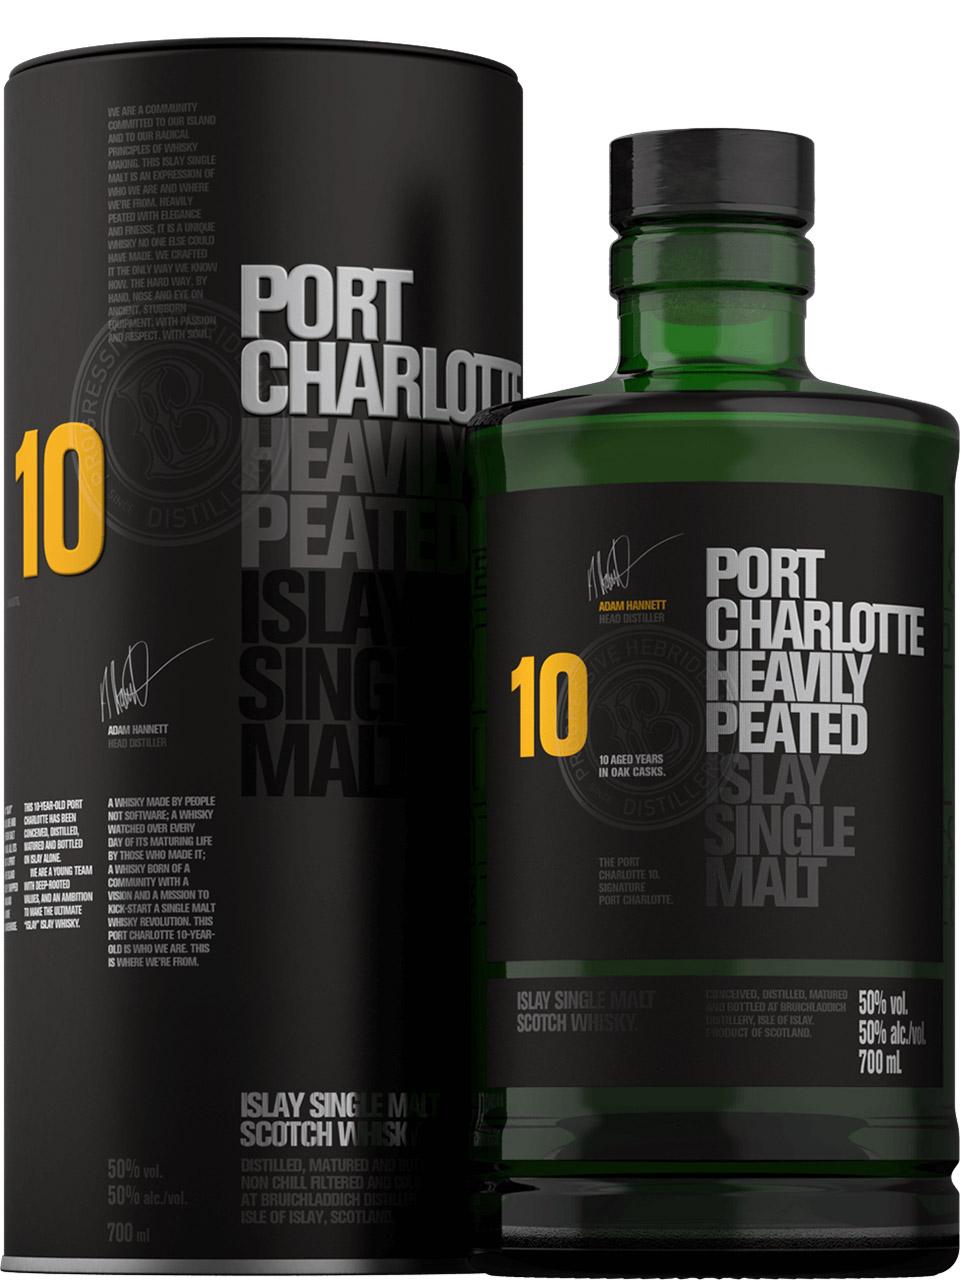 Bruichladdich Port Charlotte 10 Single Malt Scotch